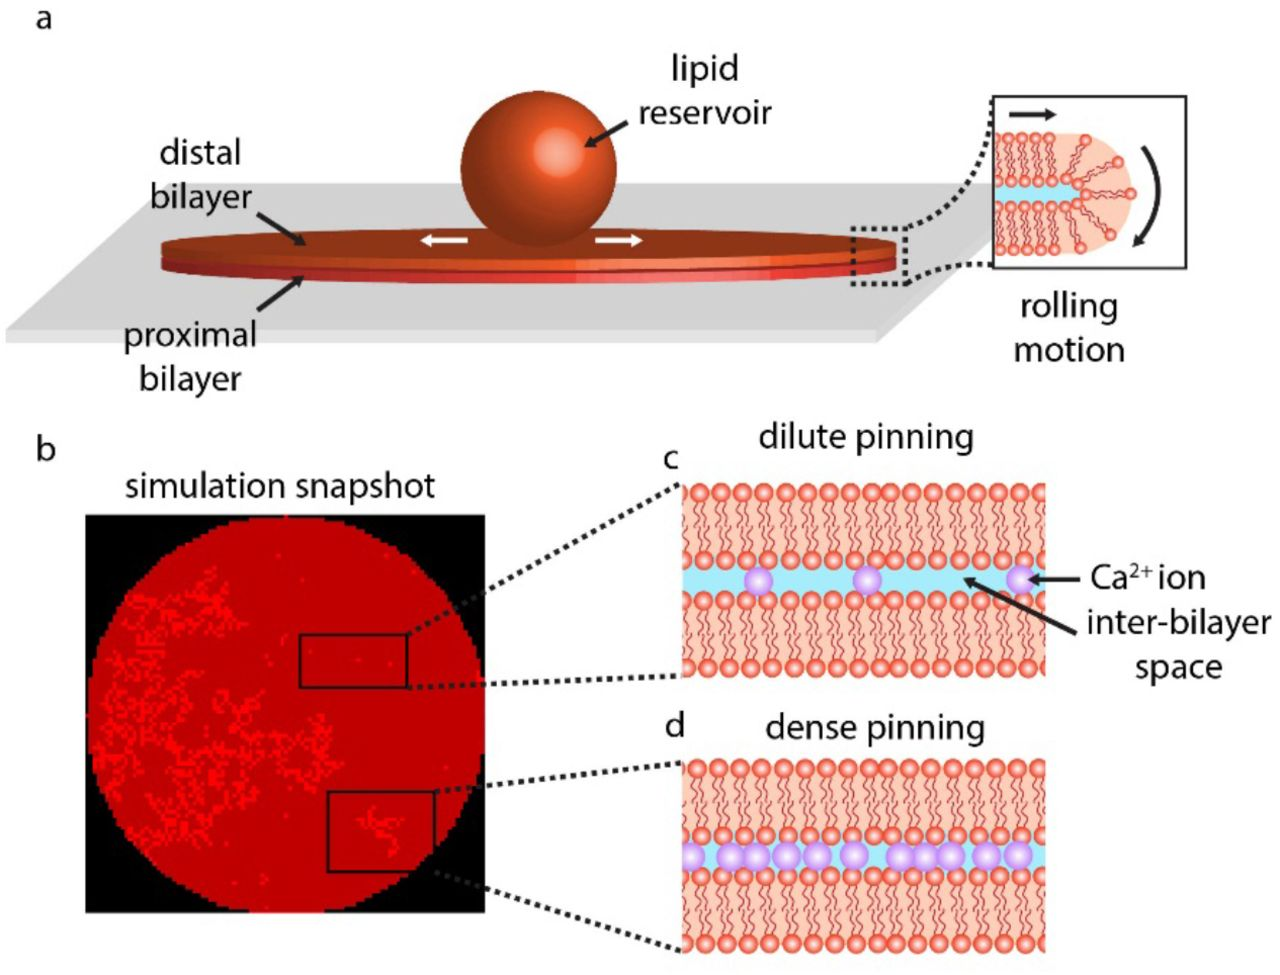 A cellular automaton for modeling non-trivial biomembrane